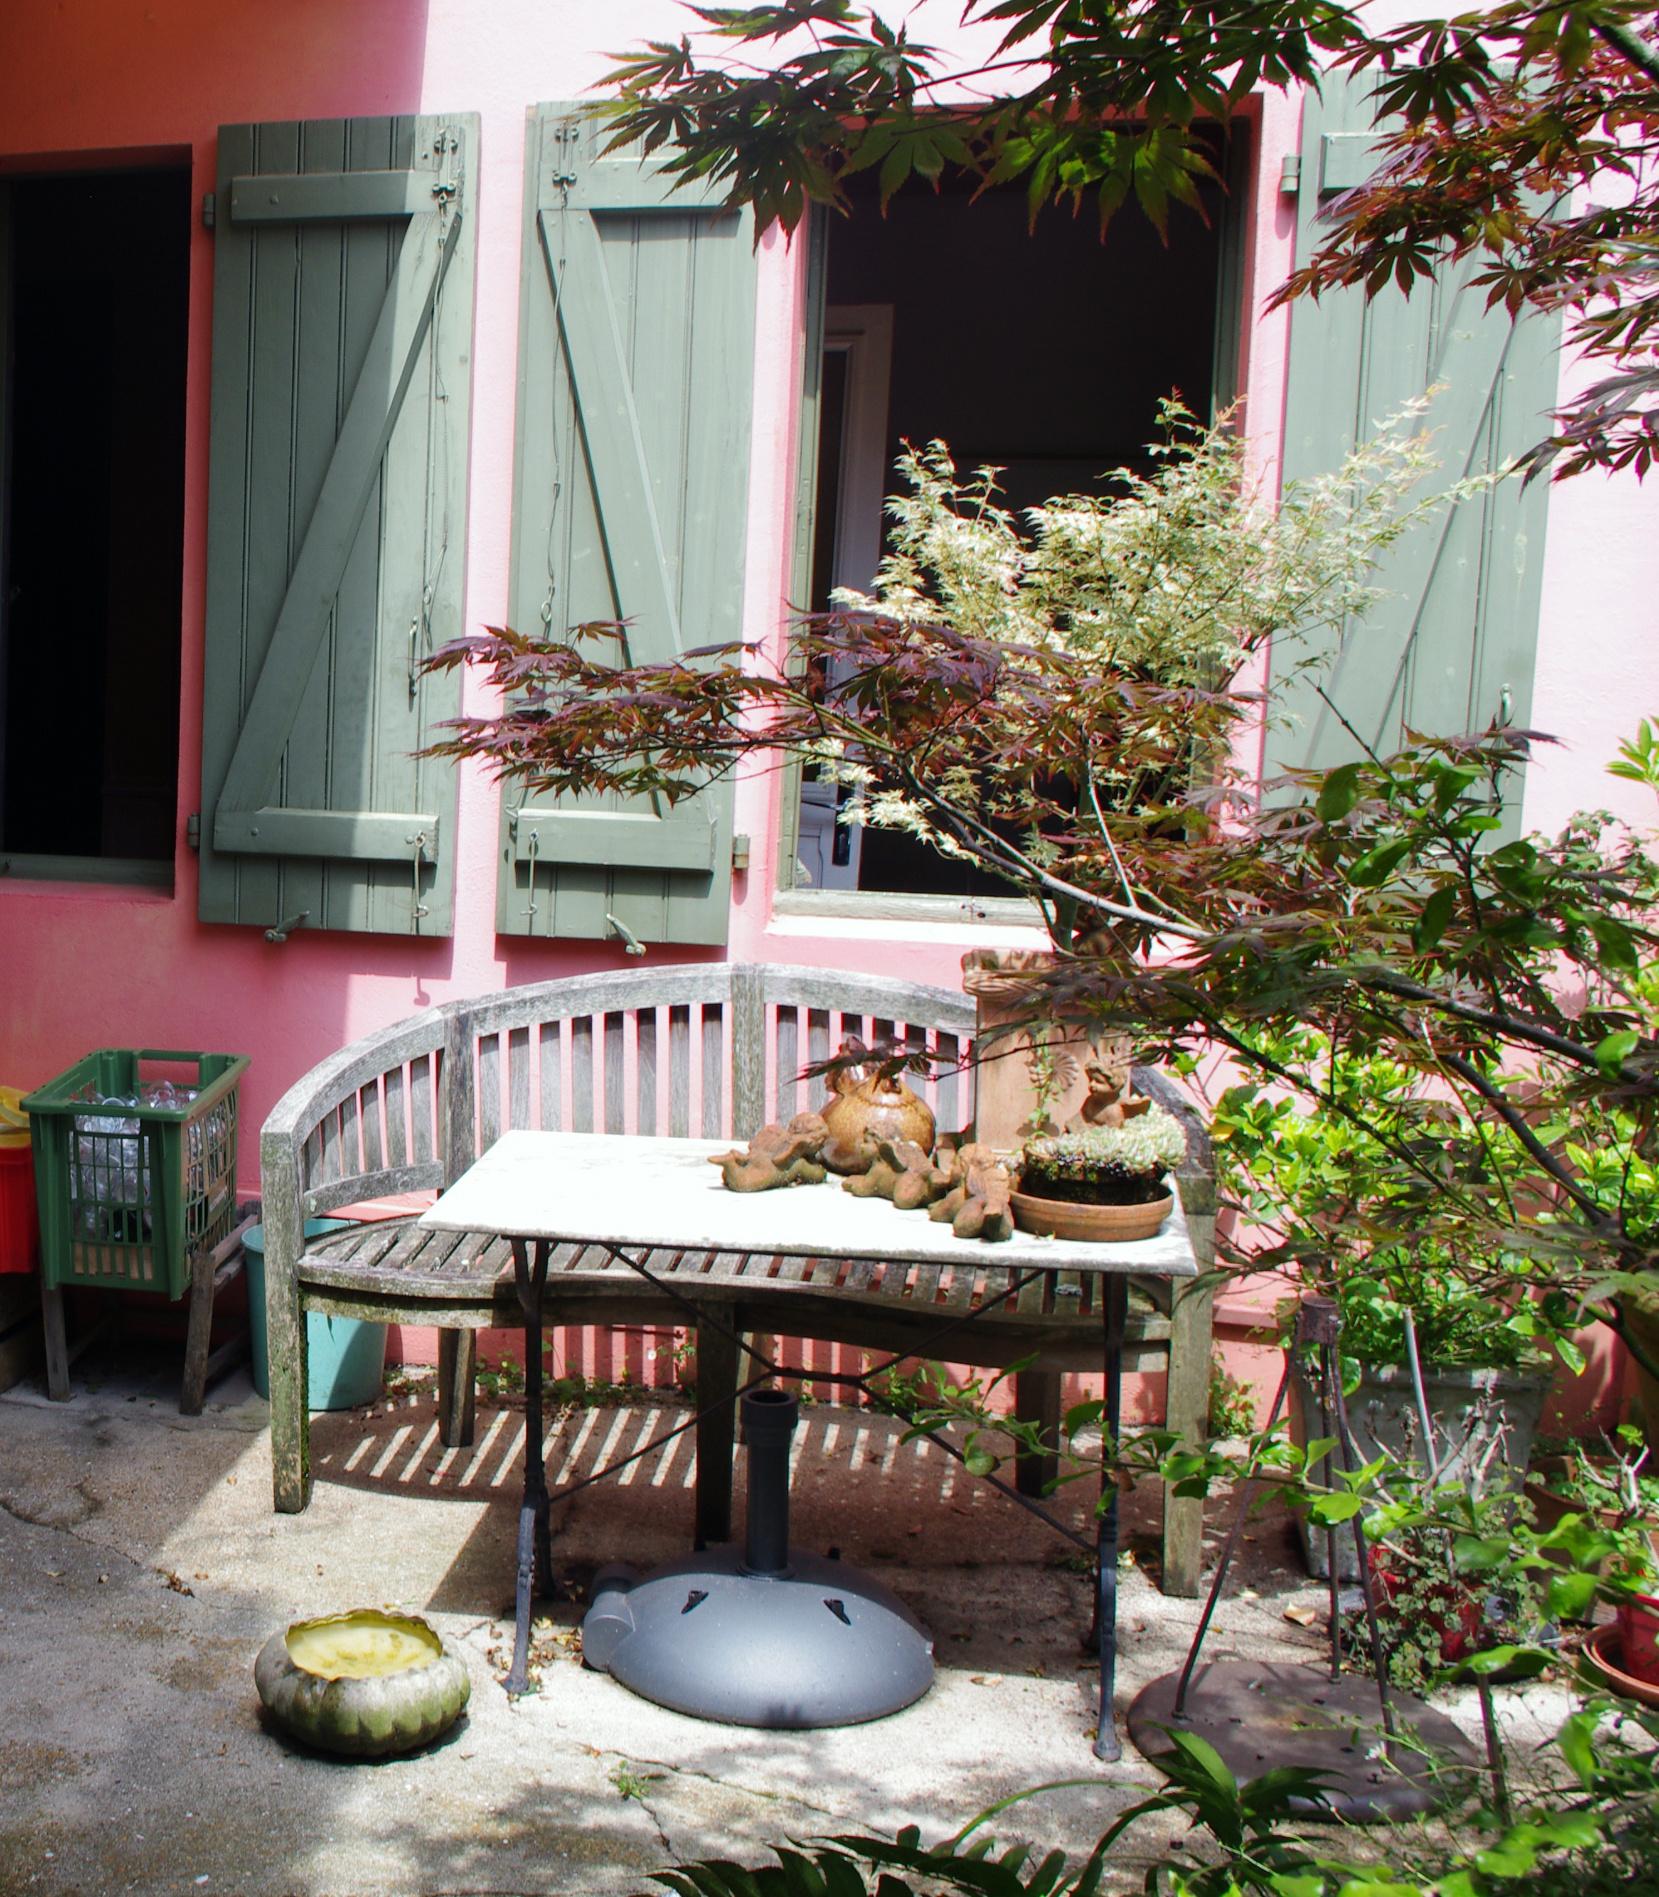 Vente achat maison hendaye ville for Achat maison hendaye